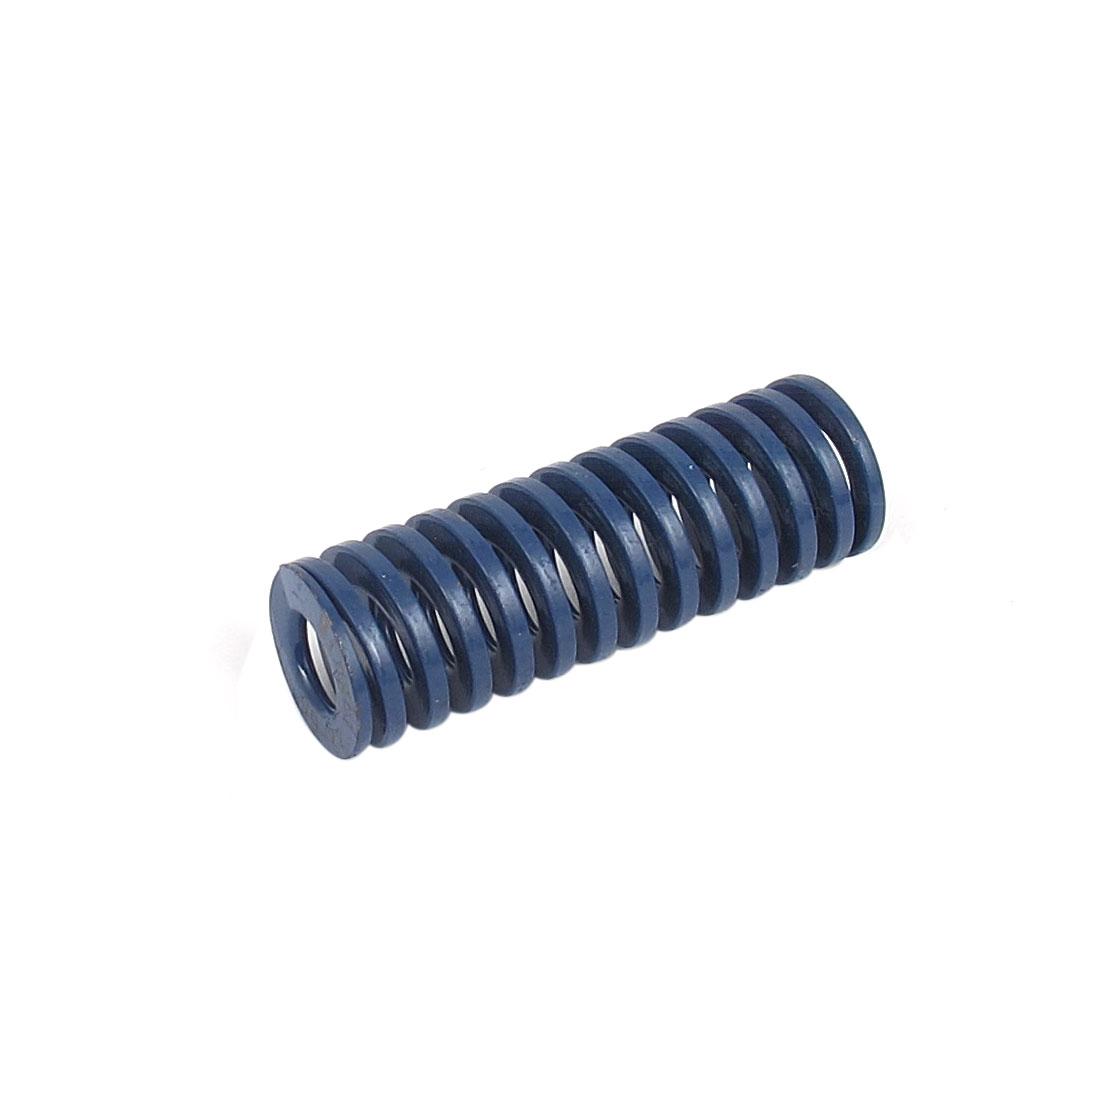 22mmx65mm Chromium Alloy Steel Light Load Die Spring Blue